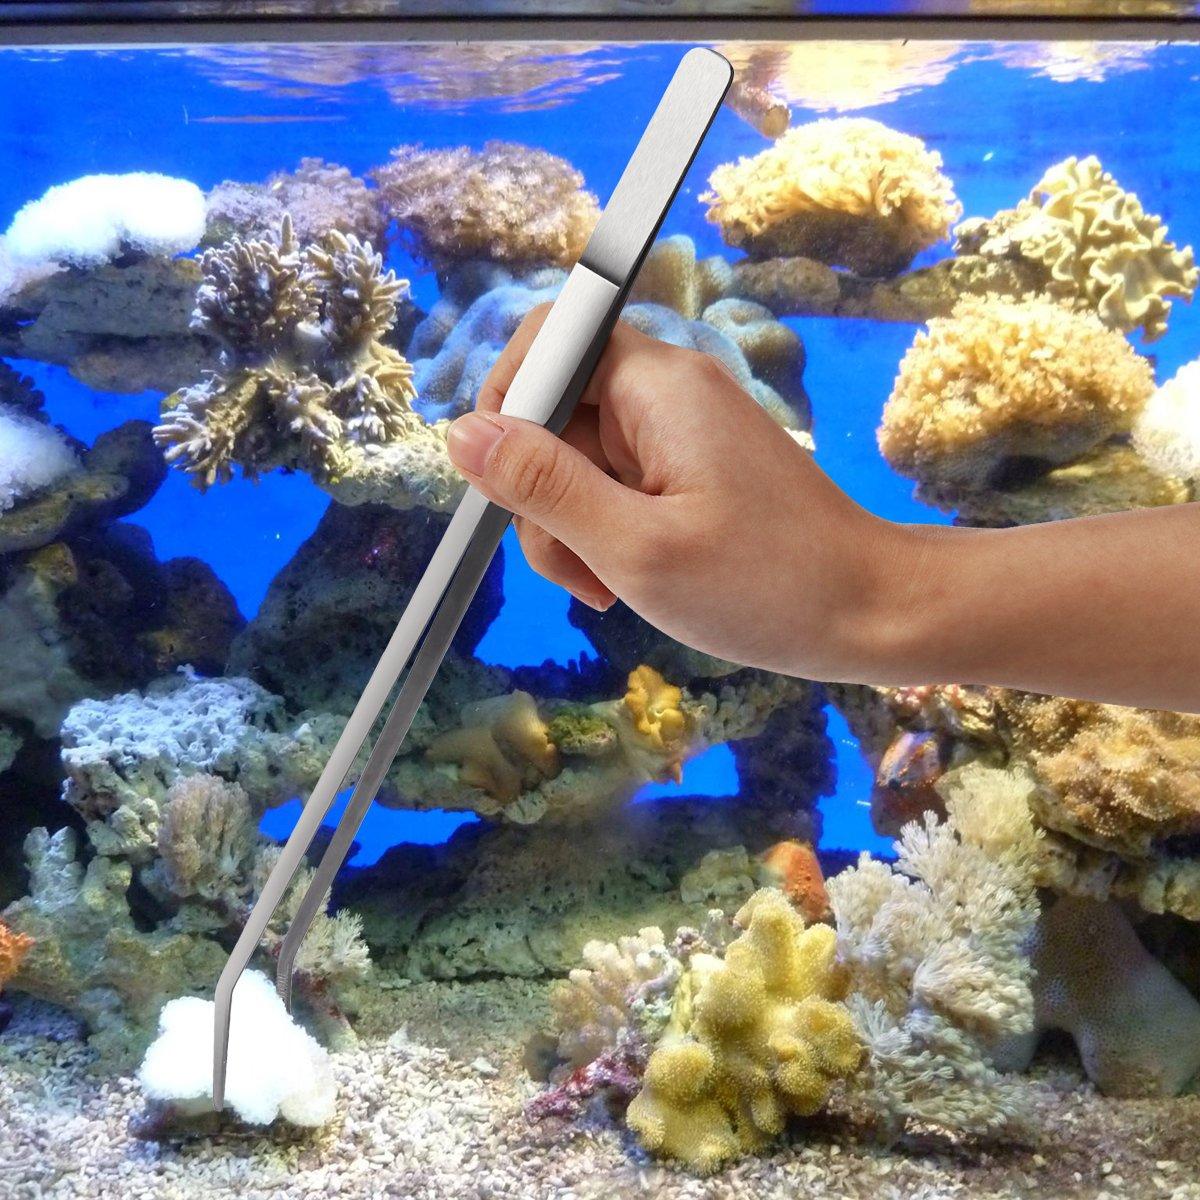 Amazon.com : UEETEK Aquarium Kit Tool Accessories Stainless Steel Aquarium Tank Water Plant Tweezers Scissors Tools Set Fish Starter Kits : Pet Supplies